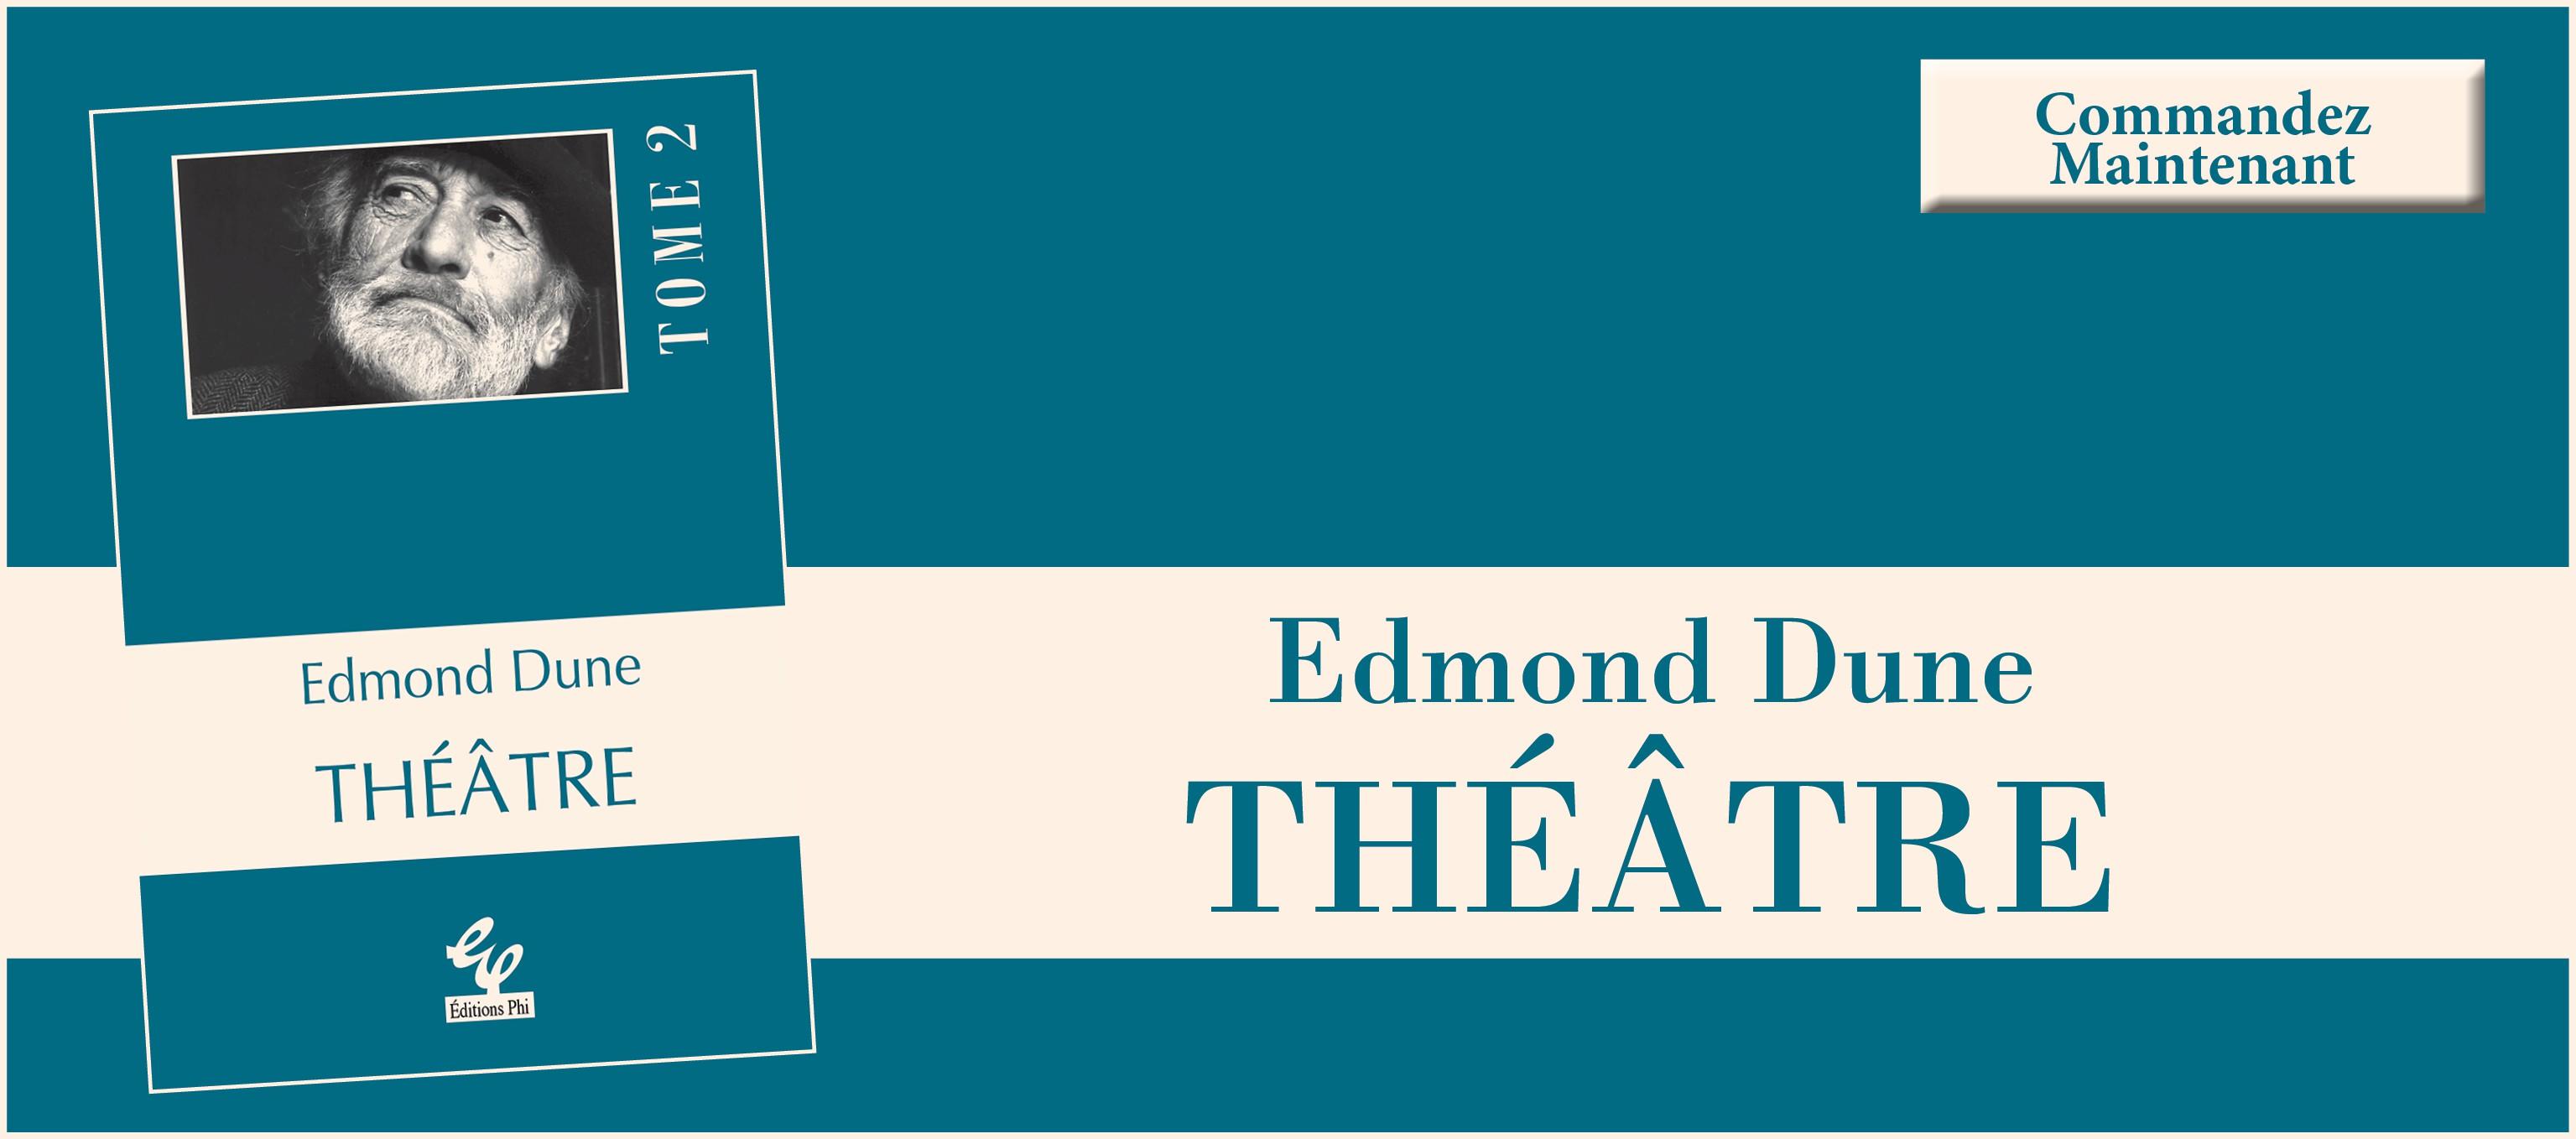 Edmond Dune - Théâtre